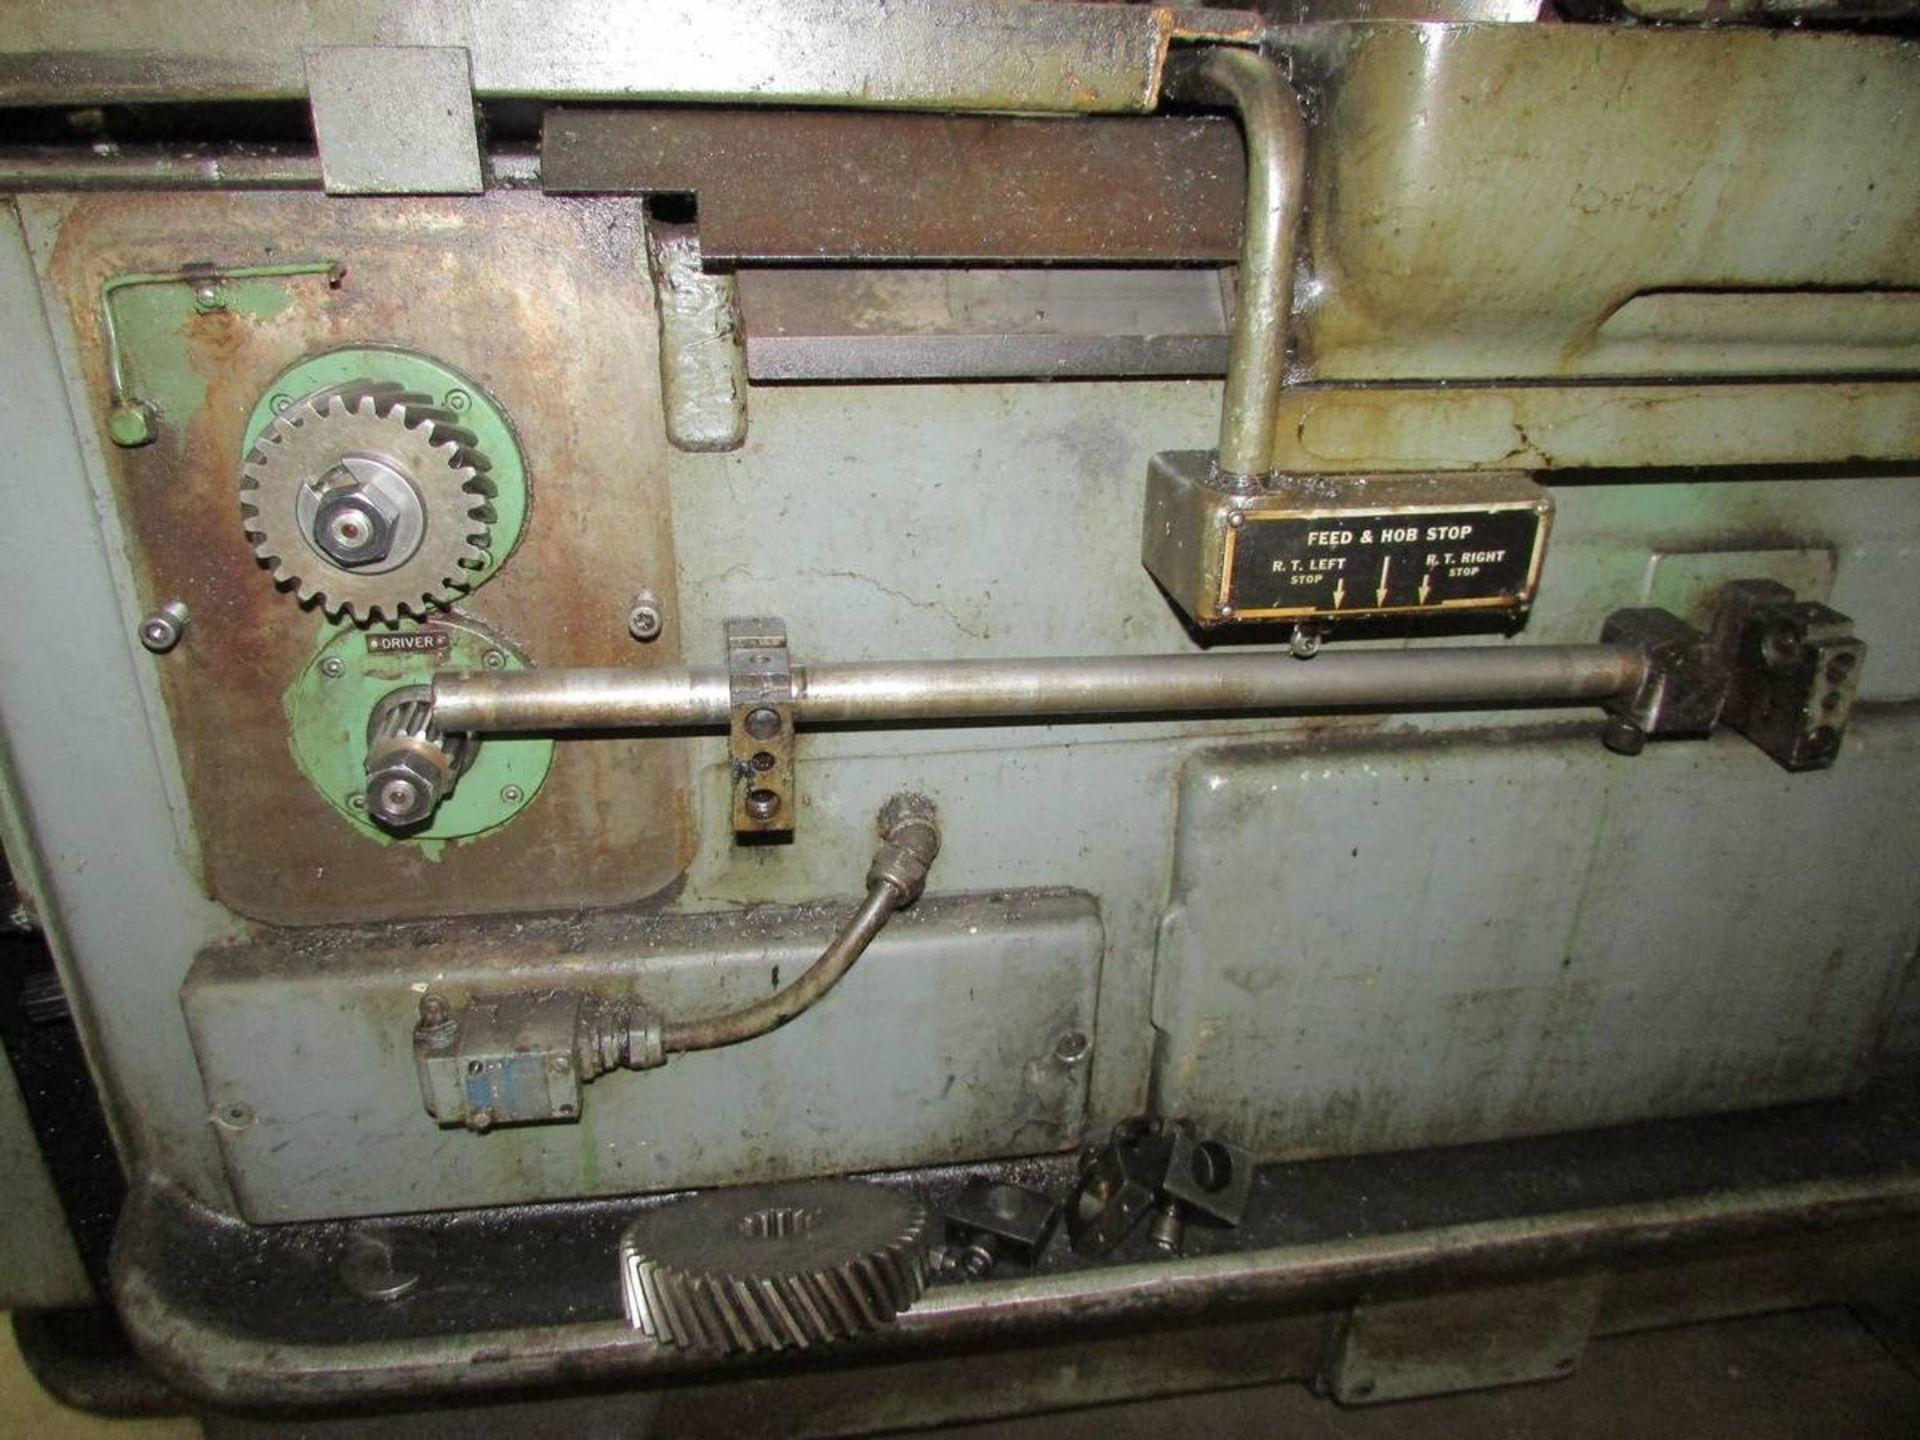 Barber Colman 16-16 Gear Hobbing Machine - Image 7 of 24